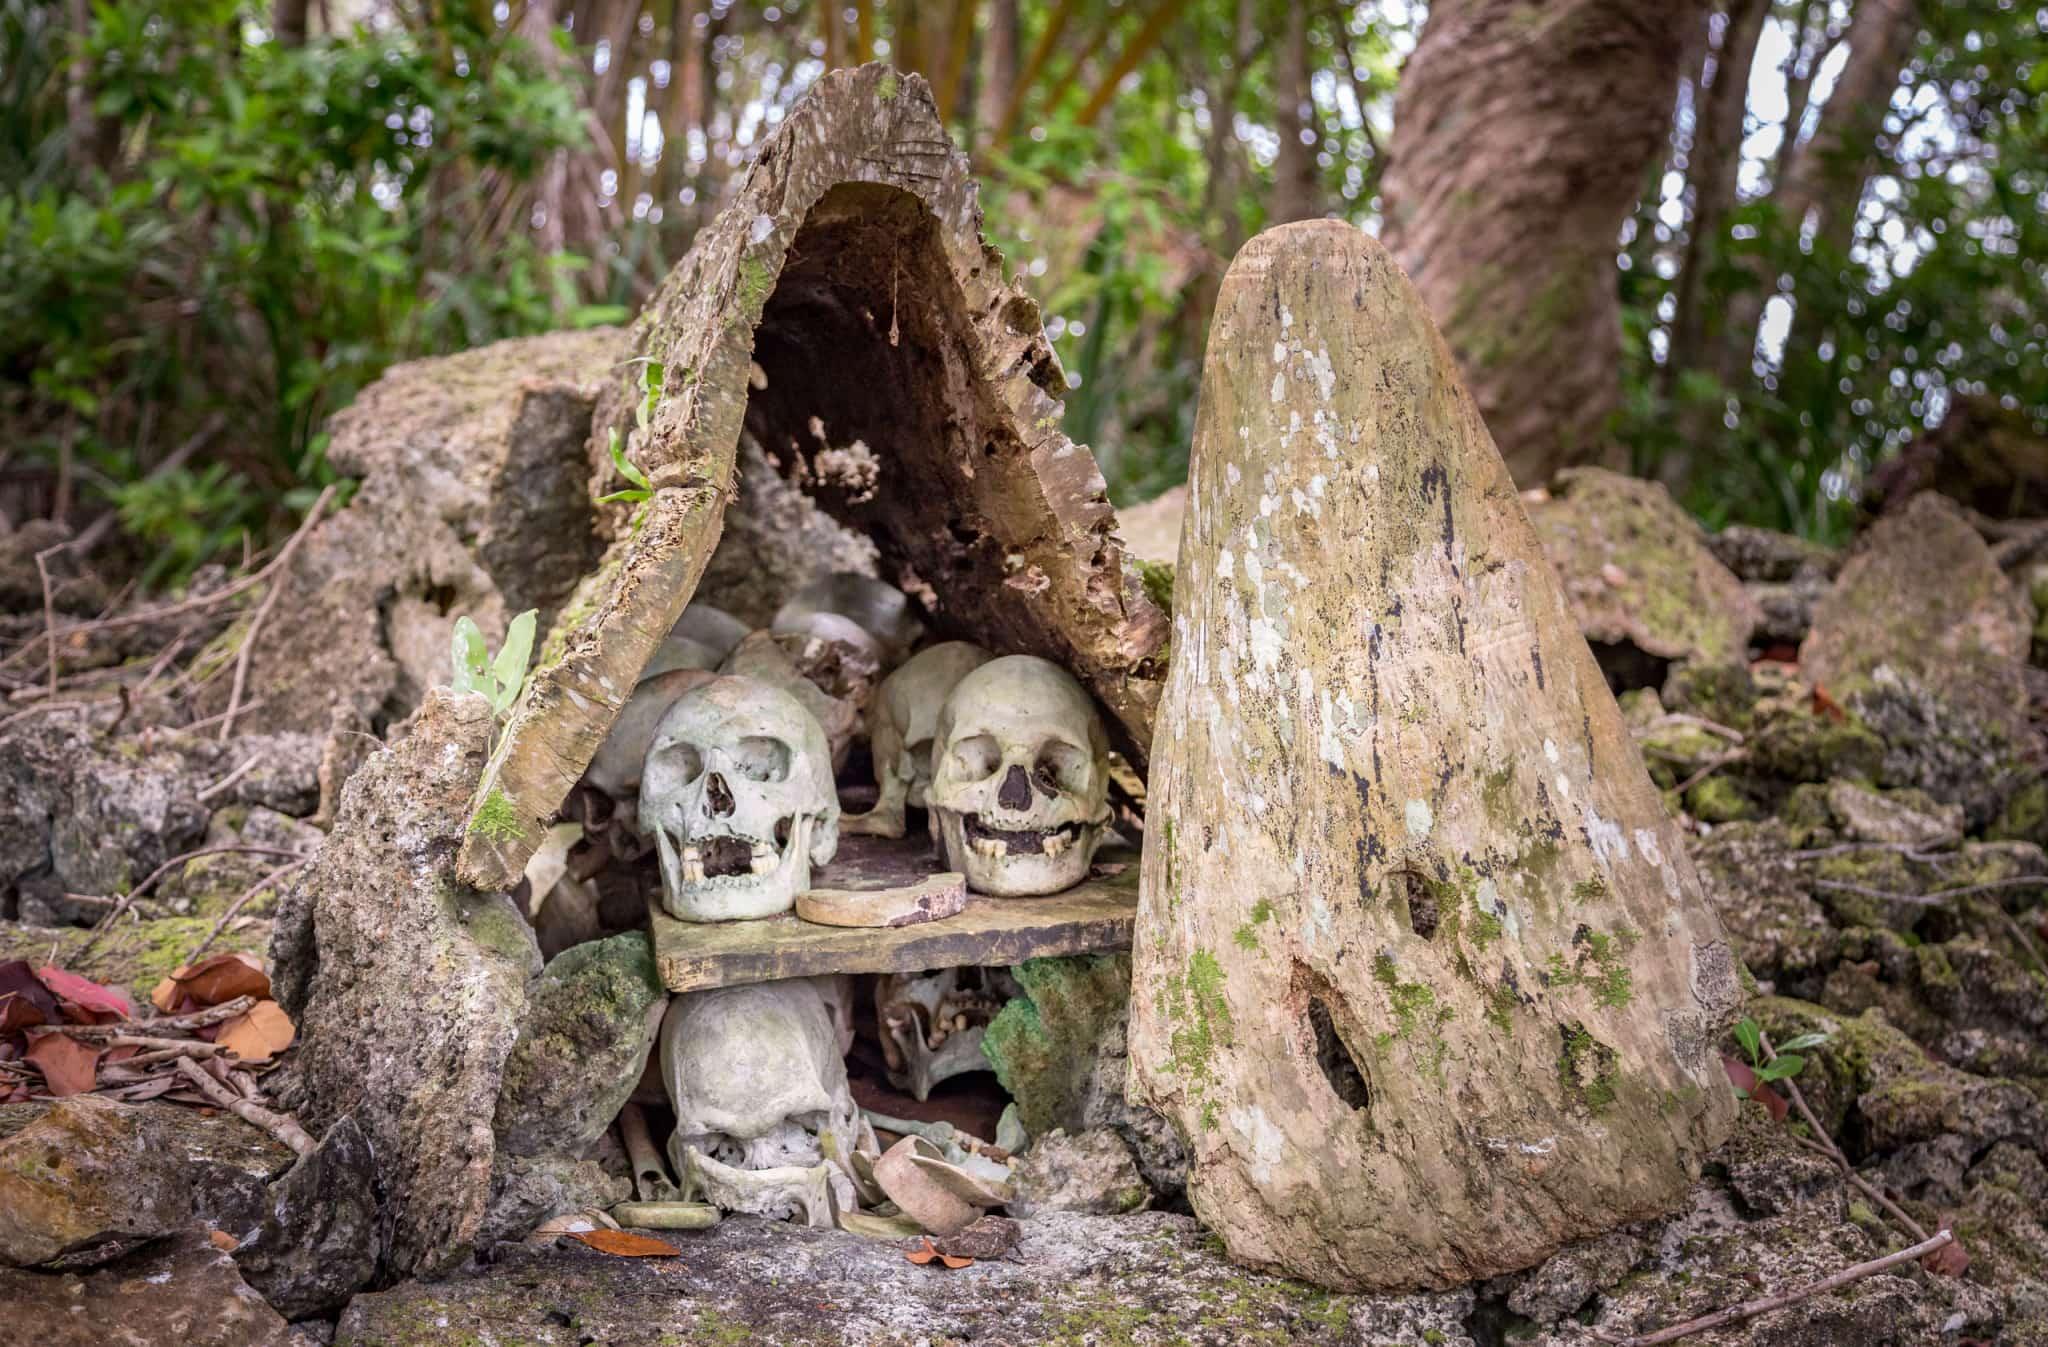 Skull Island - SOLOMON ISLANDS - 7 days in Solomon Islands itinerary: travel guide, tips & inspiration